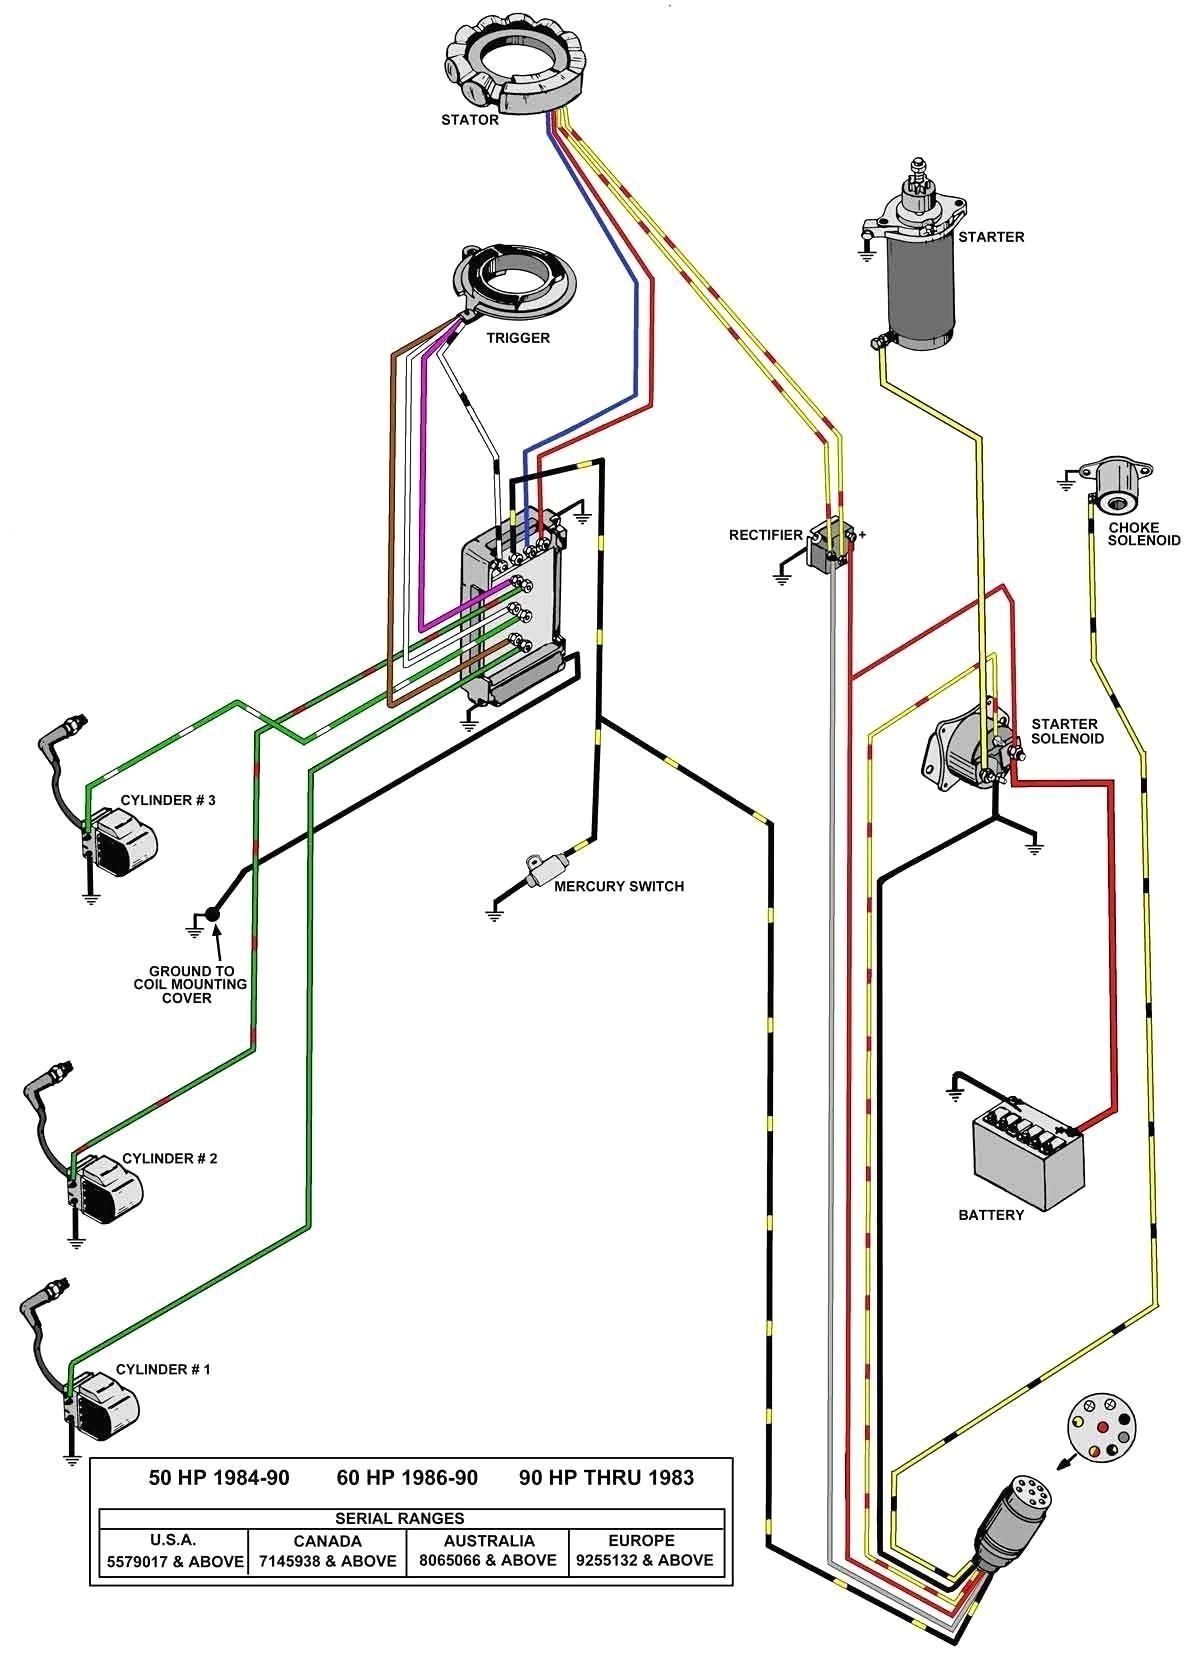 6 5 hp mercury outboard motor wiring harness wiring diagram paper mercury outboard motor wiring diagram mercury motor wiring diagram